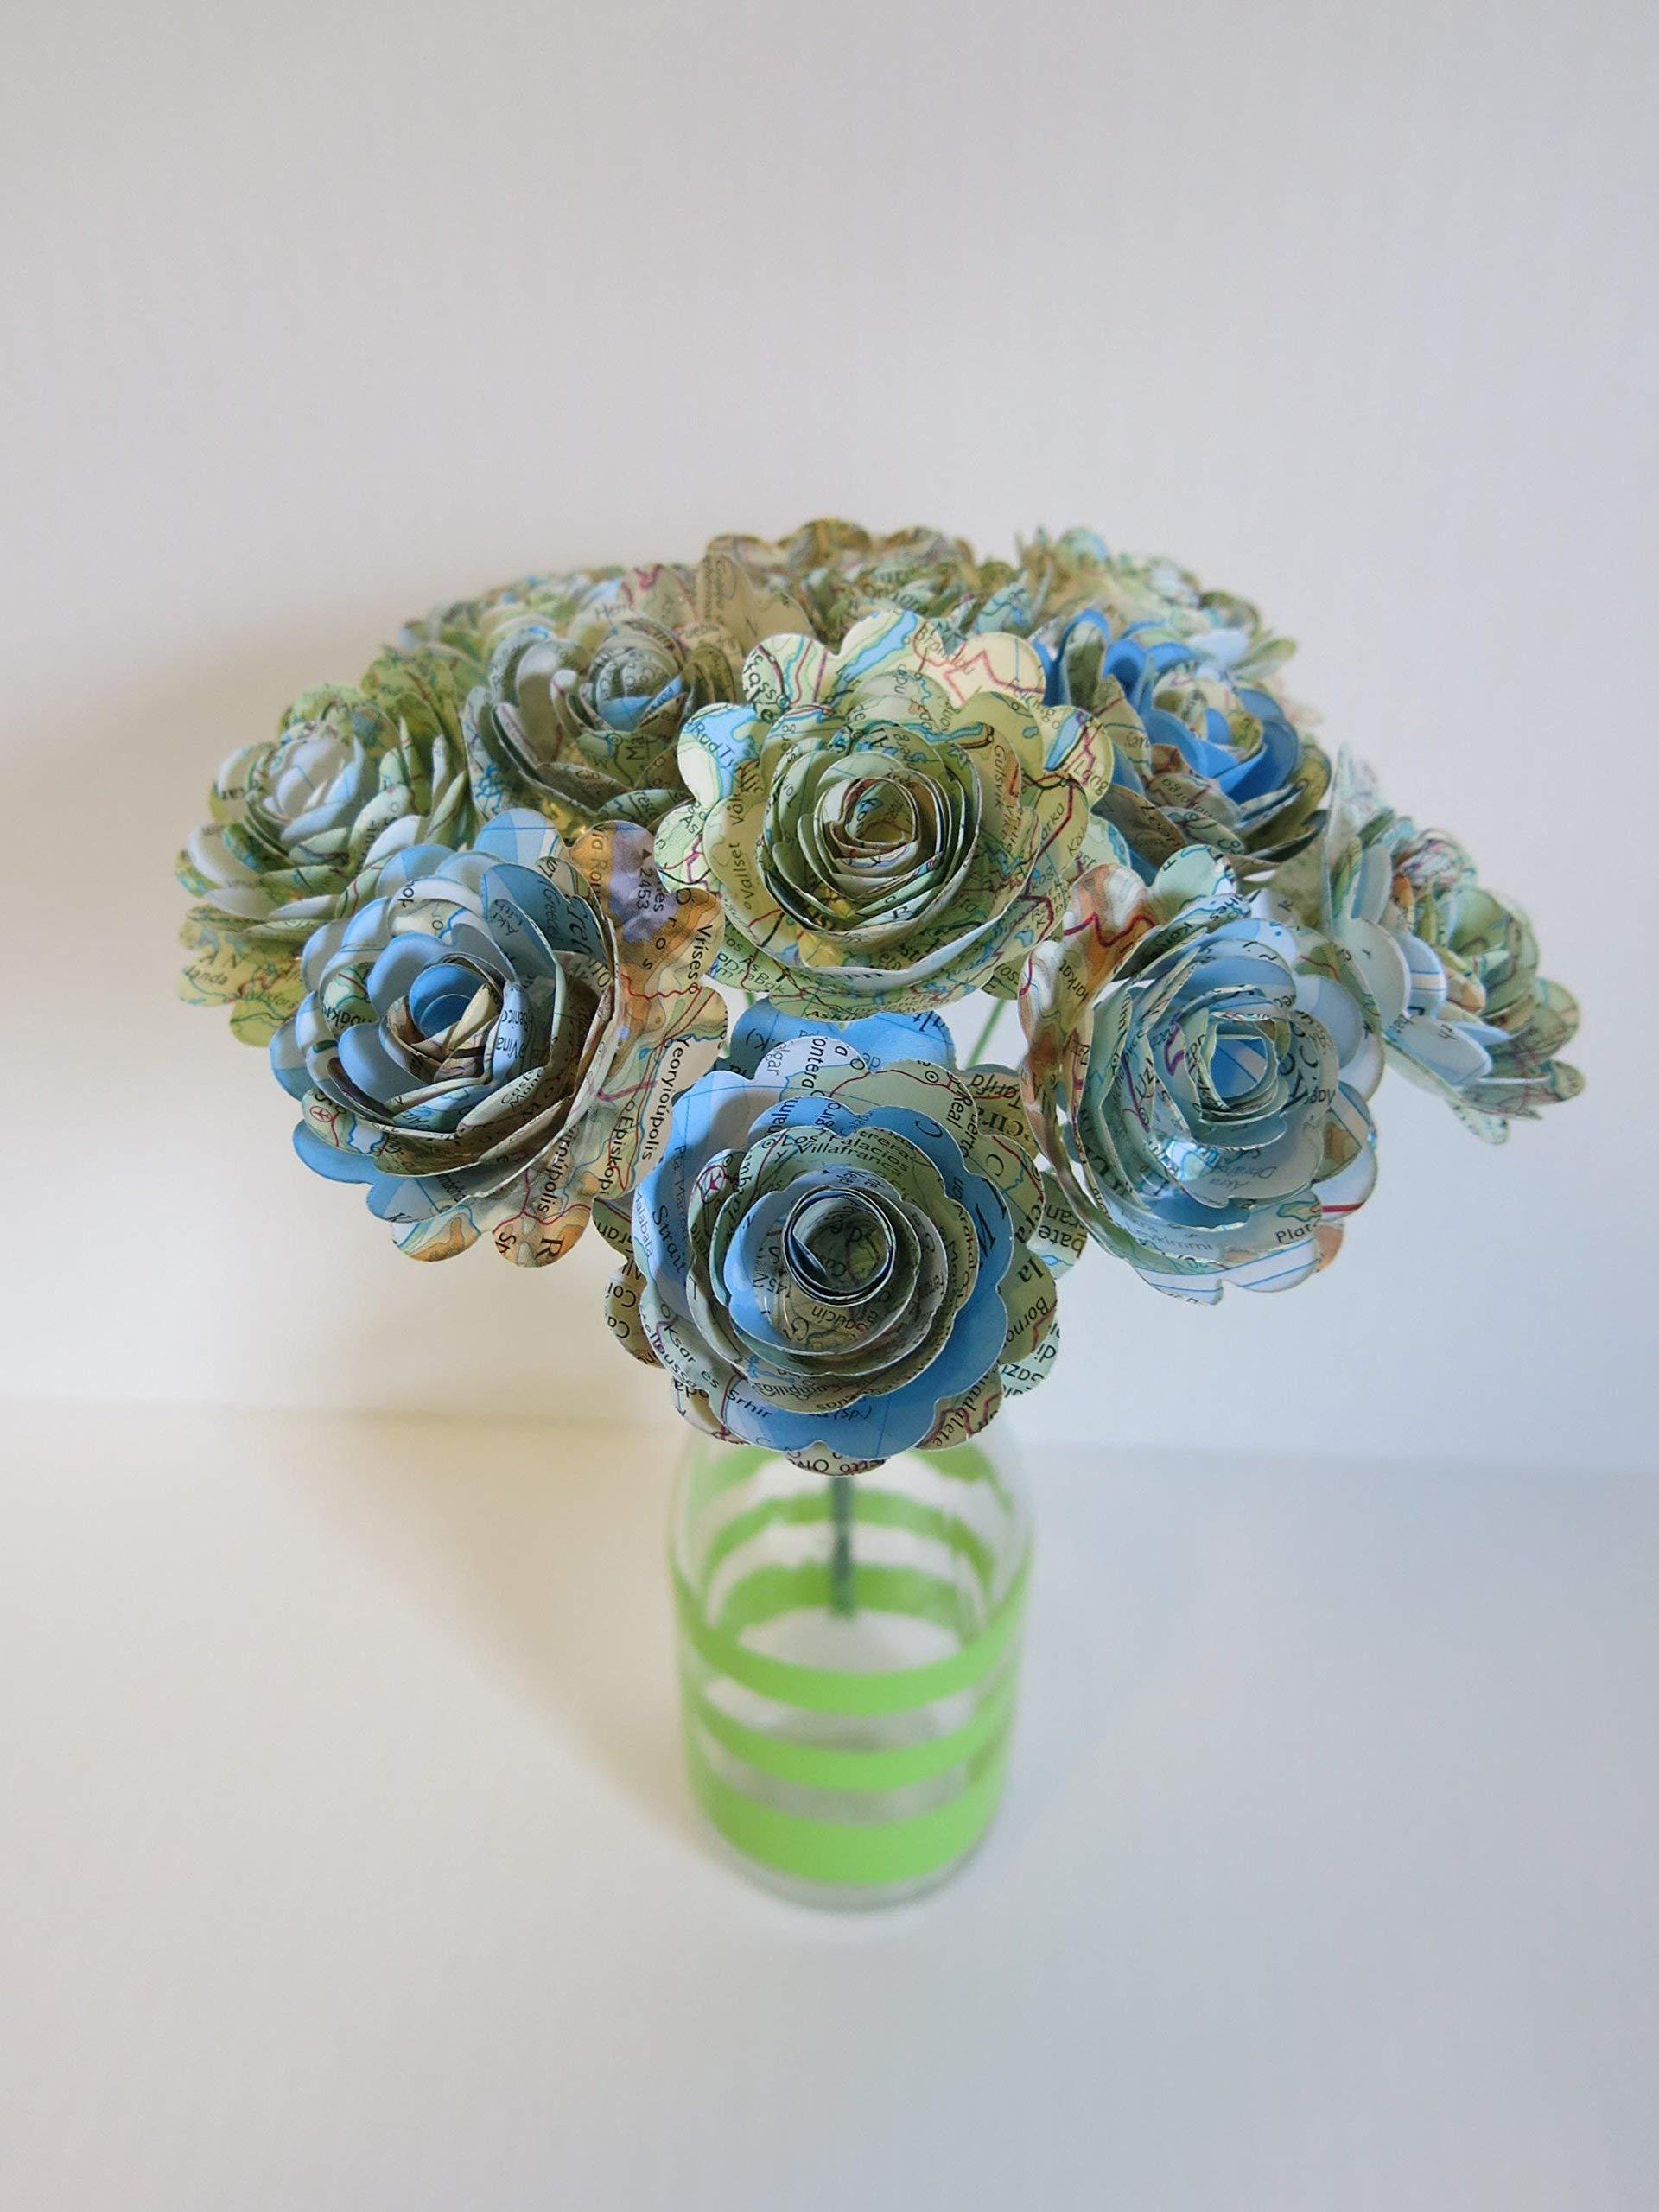 Scalloped-World-Atlas-Roses-15-Paper-Flowers-on-Stems-One-Dozen-Travel-Theme-Birthday-Party-Decor-Wedding-Decor-Bridal-Shower-Centerpiece-Map-Flowers